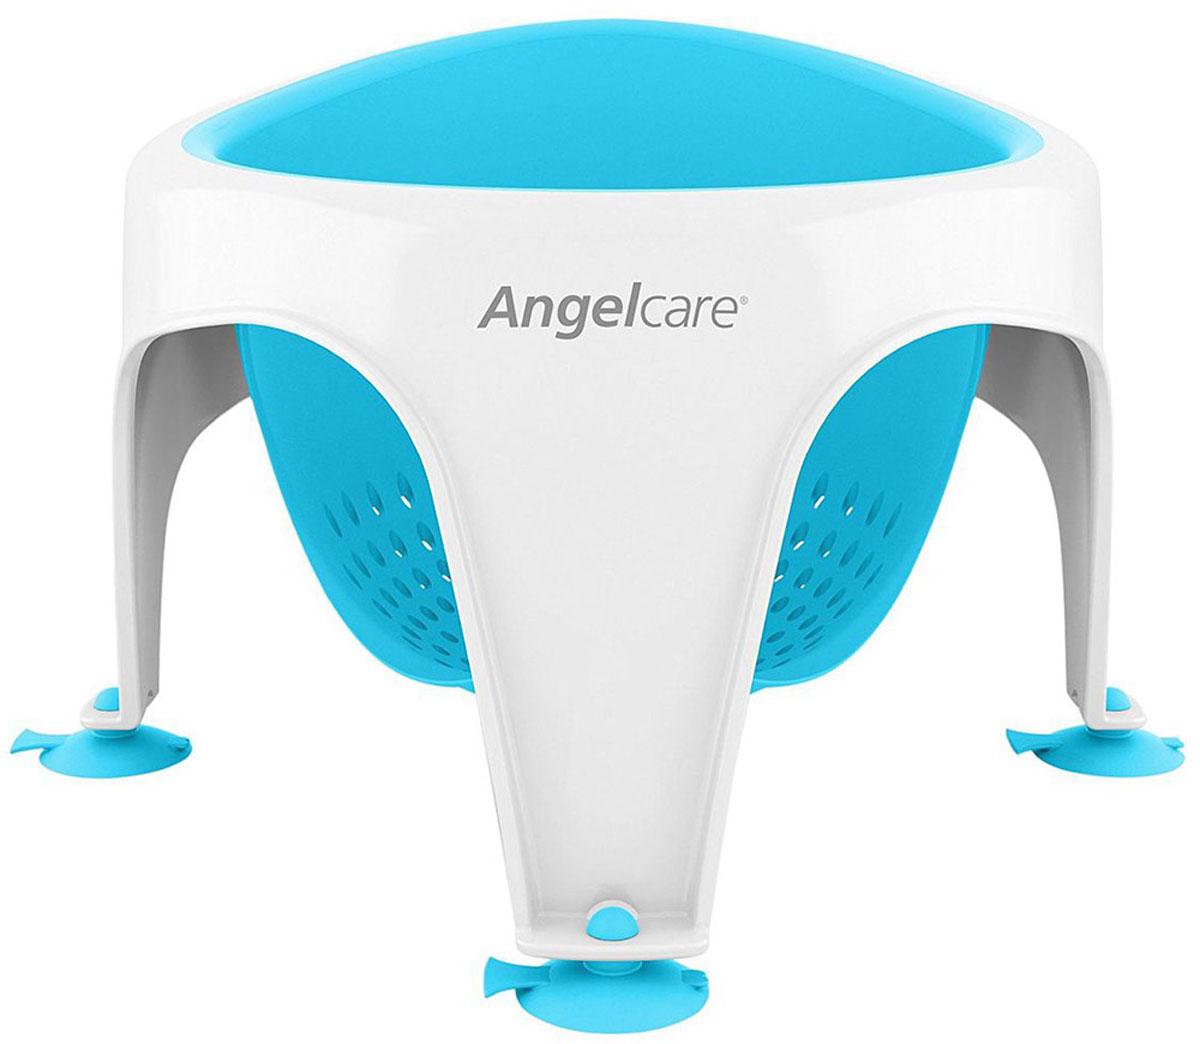 Angelcare Стульчик для купания Bath Ring -  Все для купания